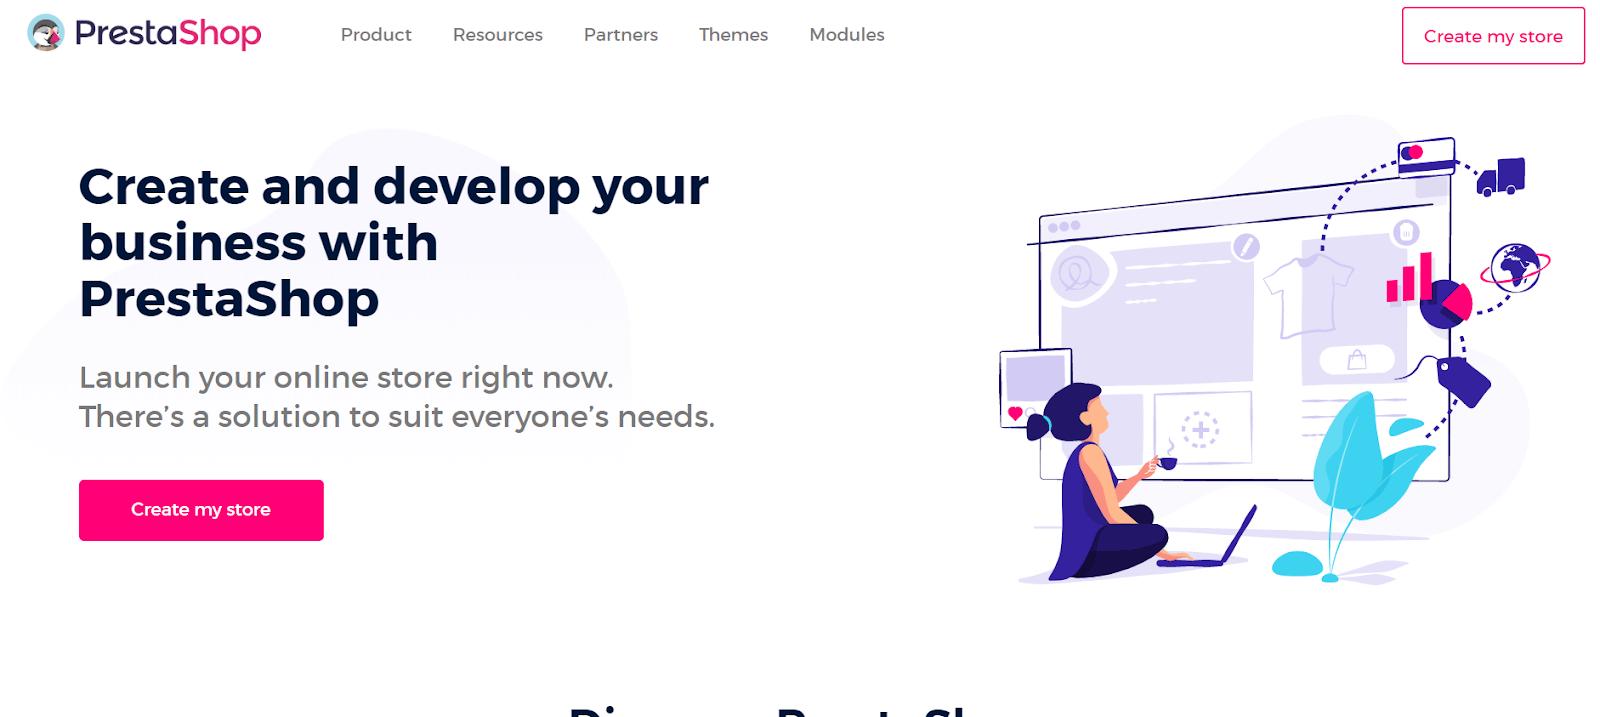 PrestaShop Best eCommerce tools